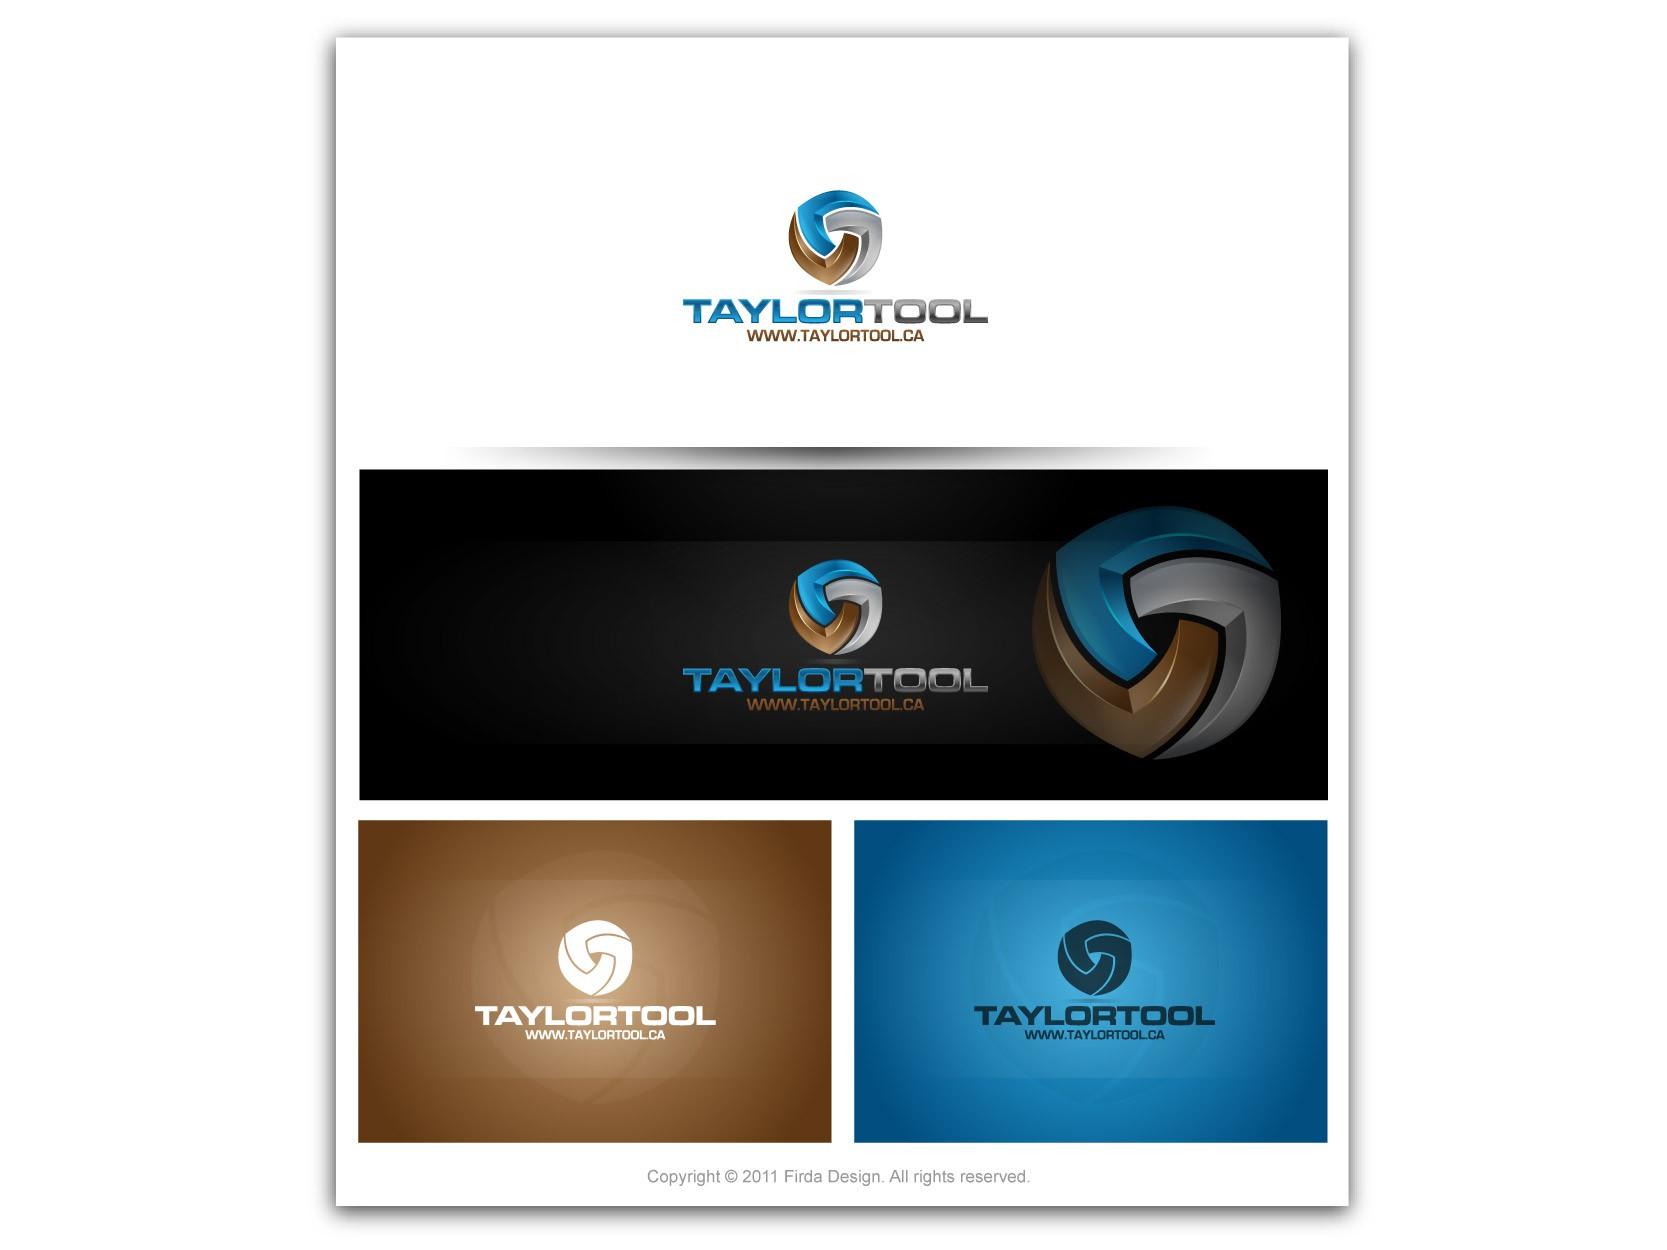 logo for Taylor Tool  www.taylortool.ca